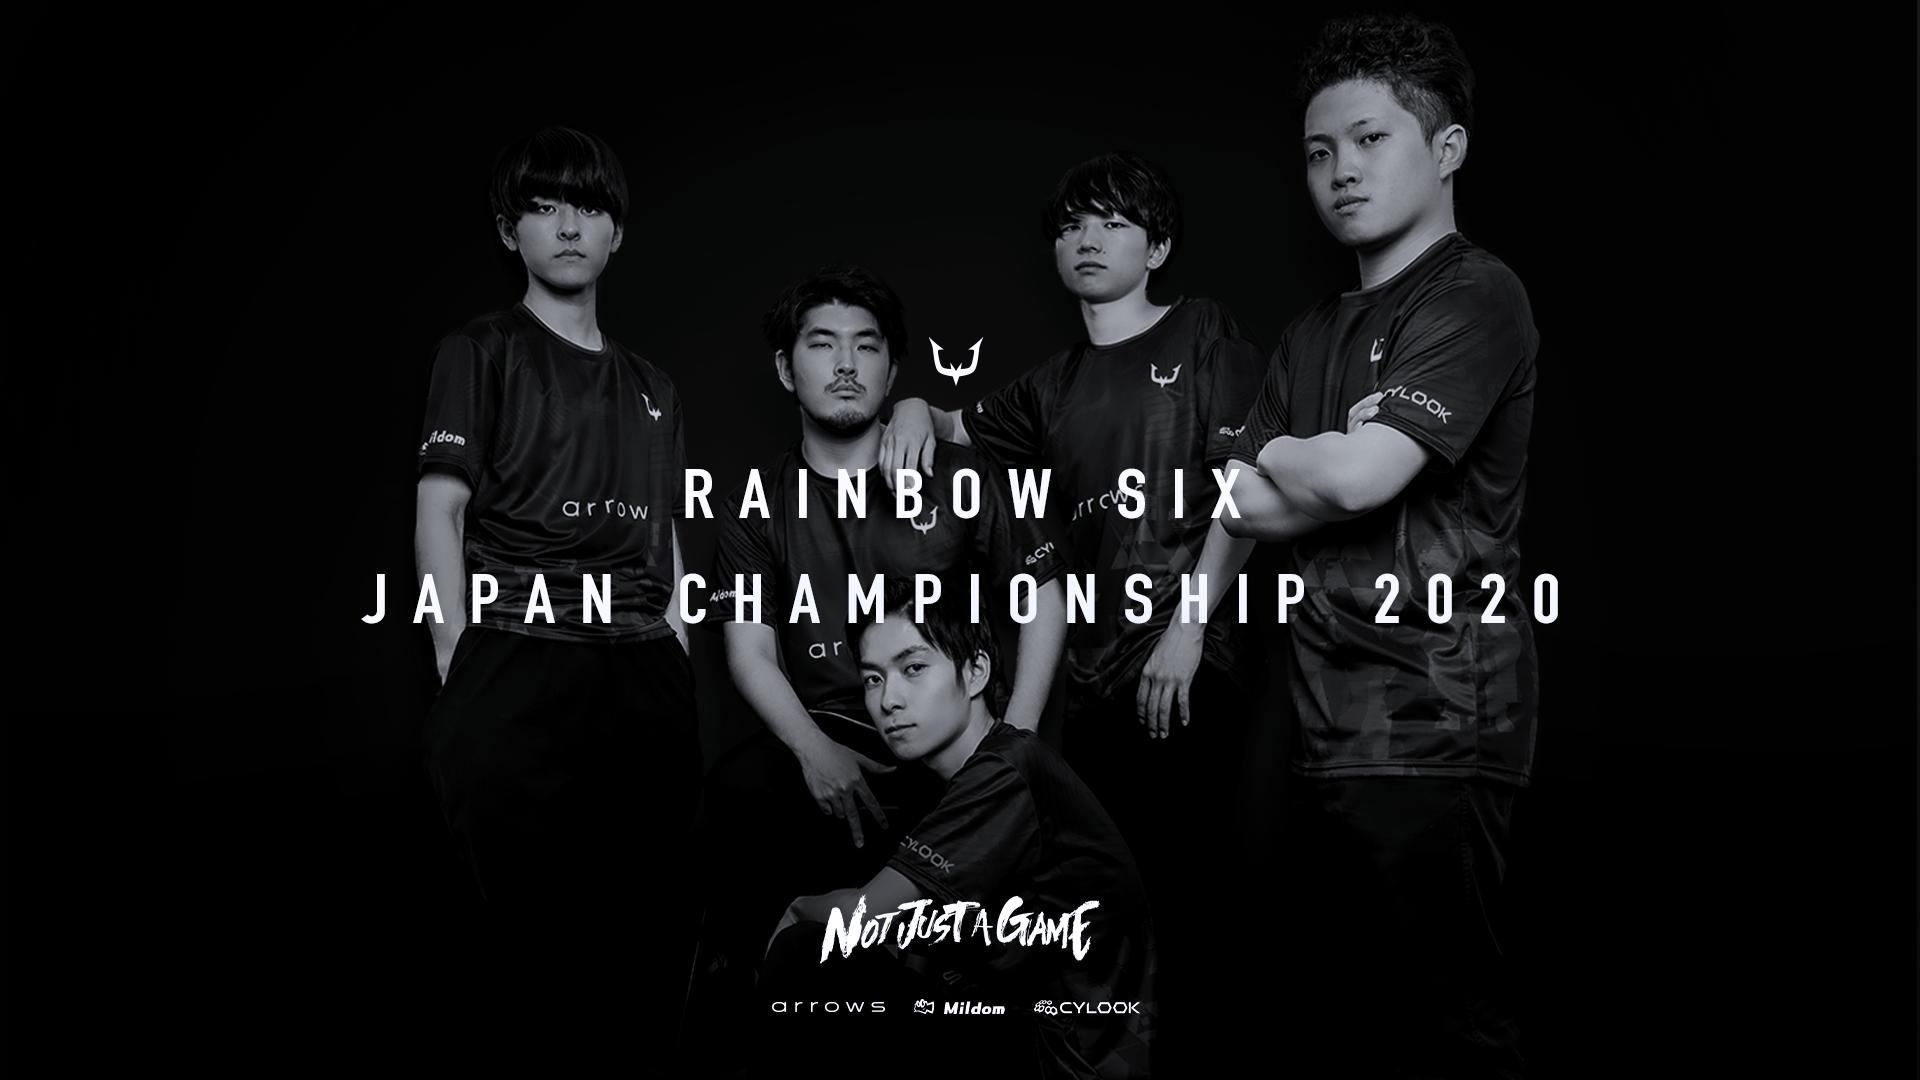 【RAINBOW SIX】新体制での初大会、『RAINBOW SIX JAPAN CHAMPIONSHIP 2020』出場